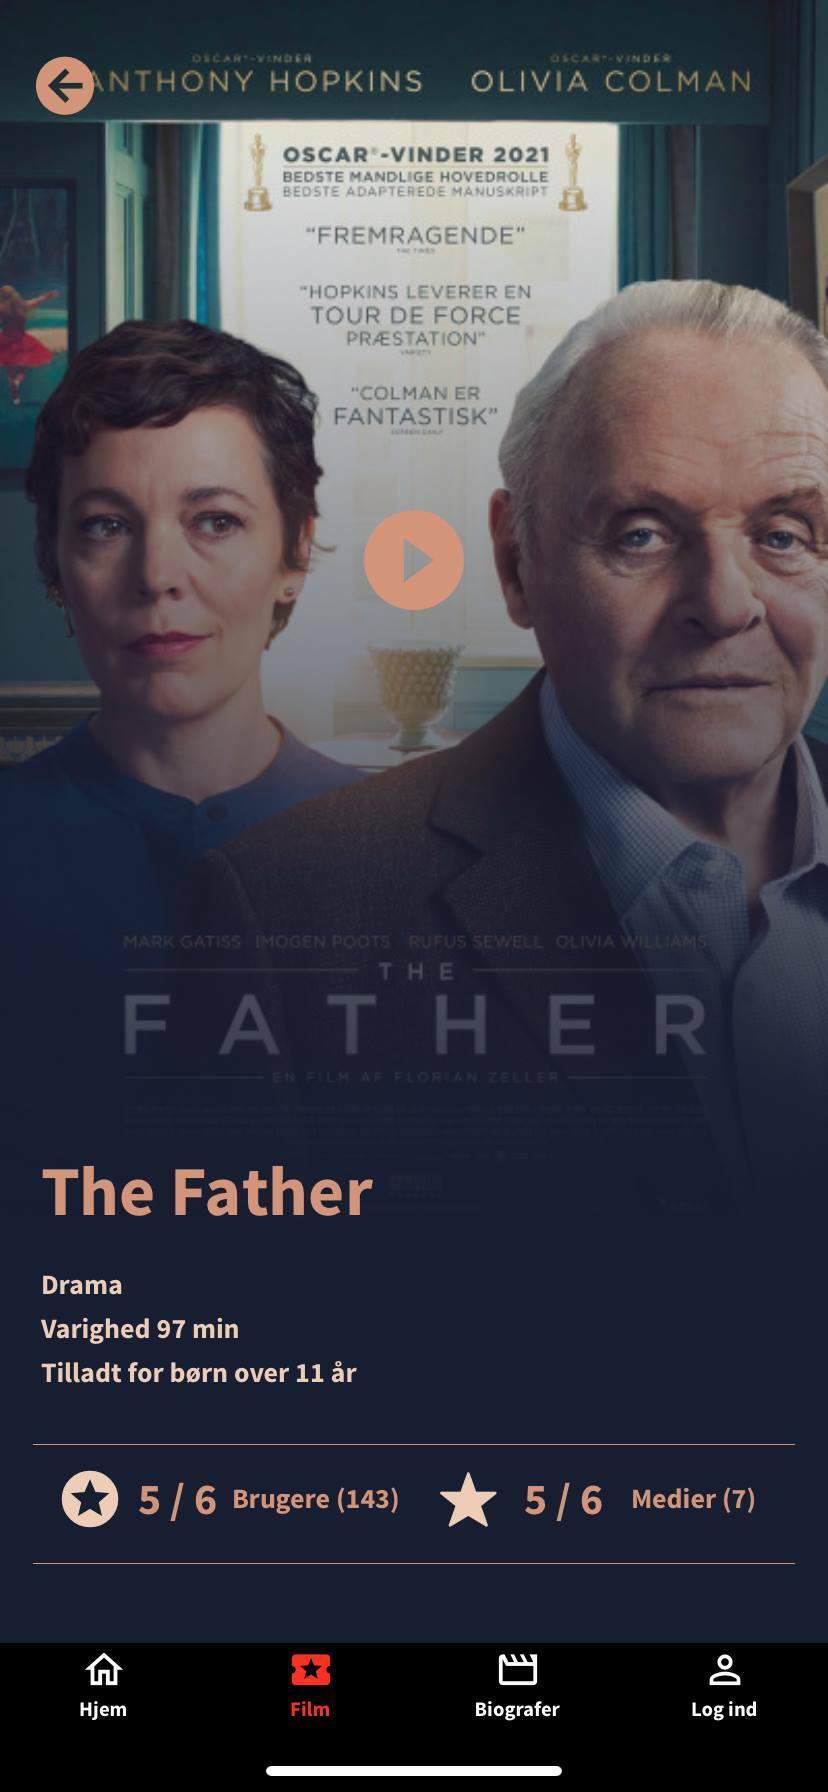 the father movie profile kino app